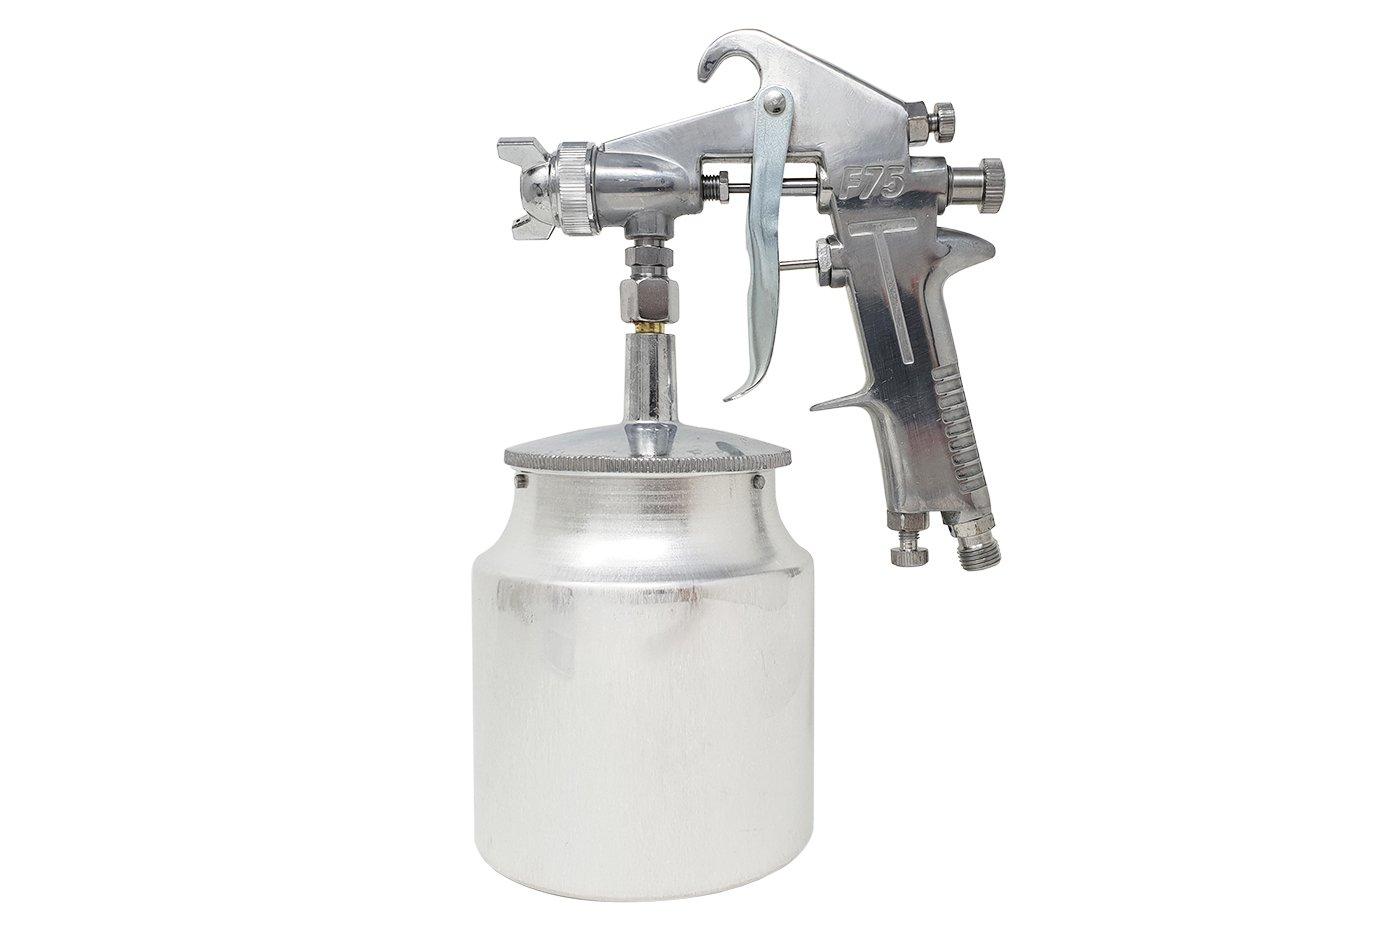 BES 24209 Pistola a Spruzzo, Compressore per Vernice Ad Aria Spray Pittura BES SRL